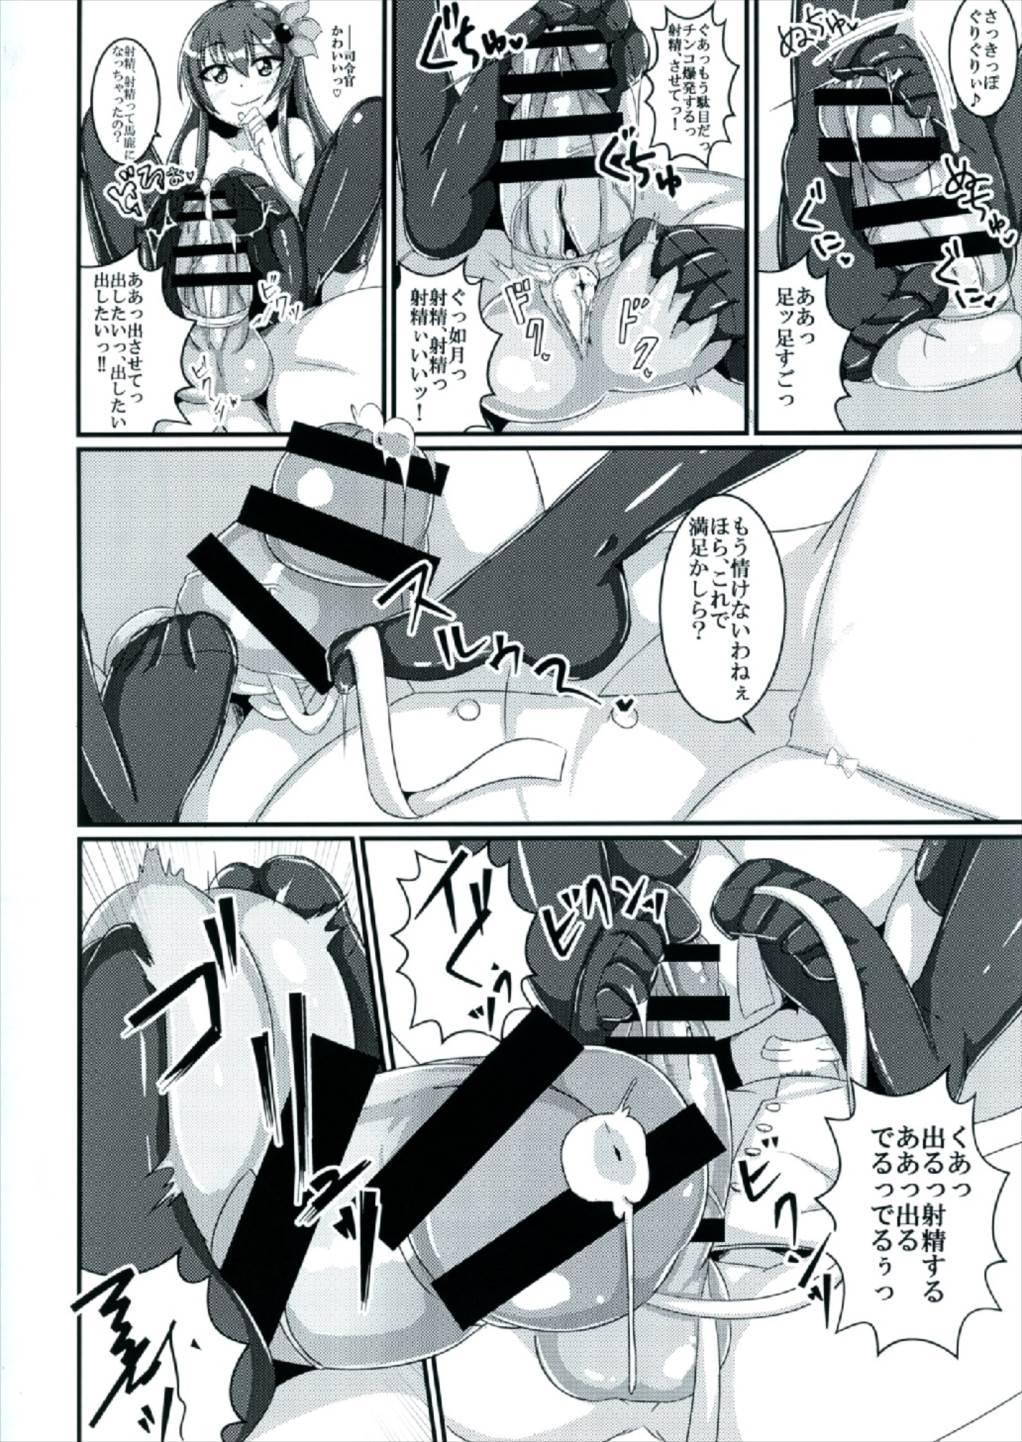 Mou Kisaragi Shika Aisenai! 9